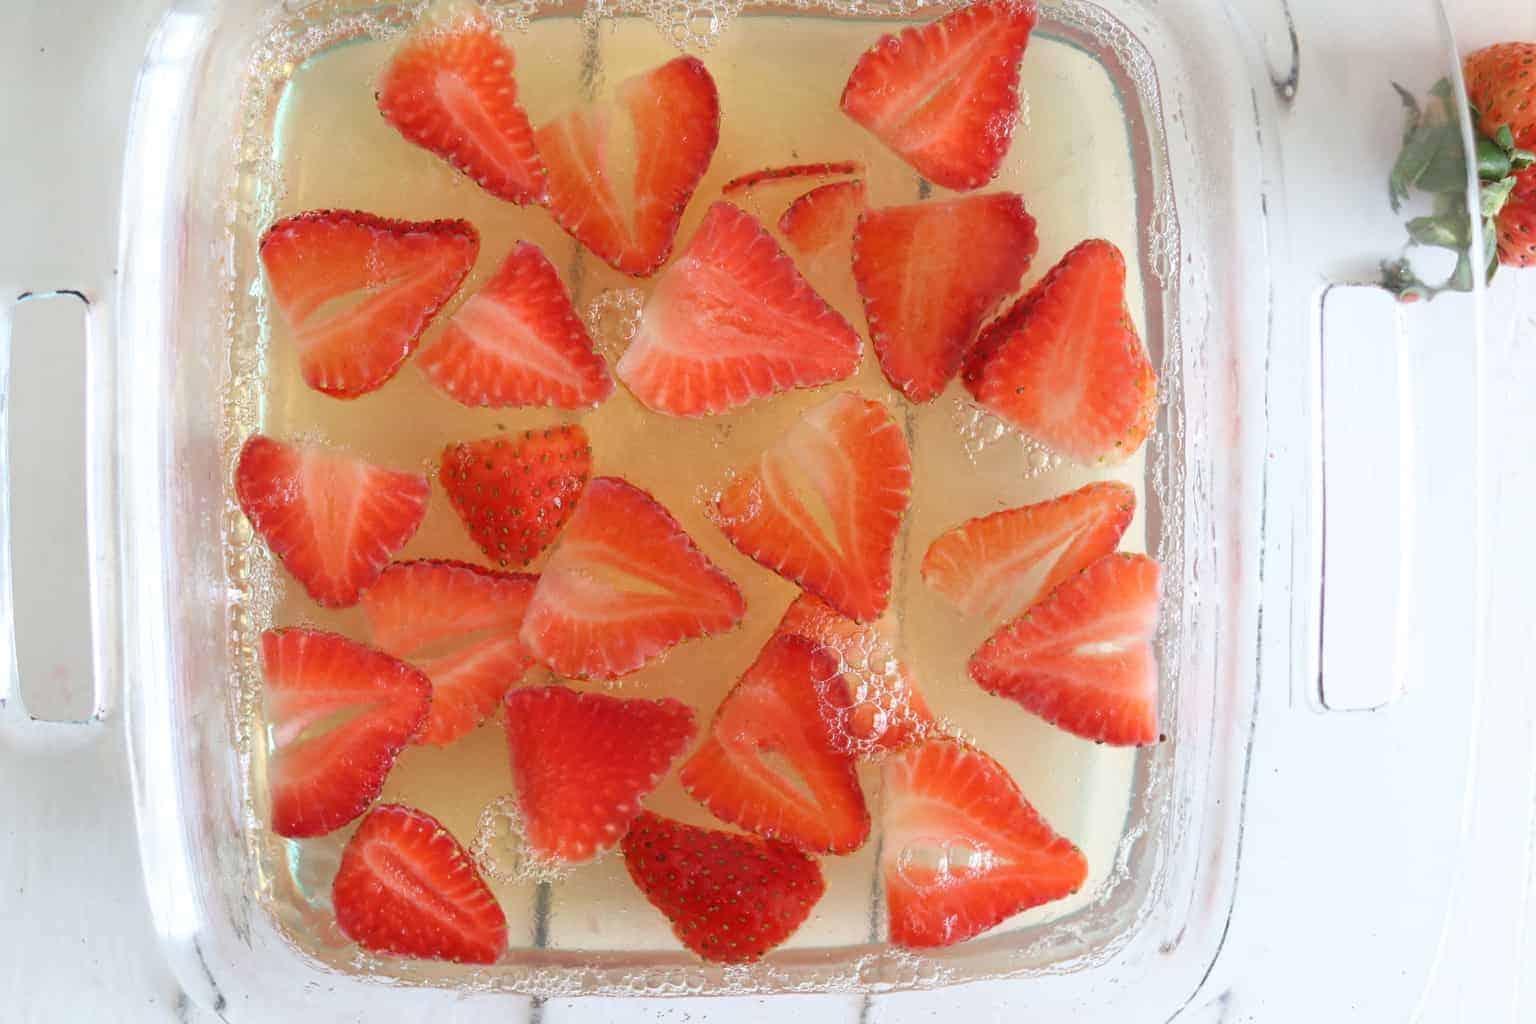 Healthy homemade strawberry jello in baking pan.